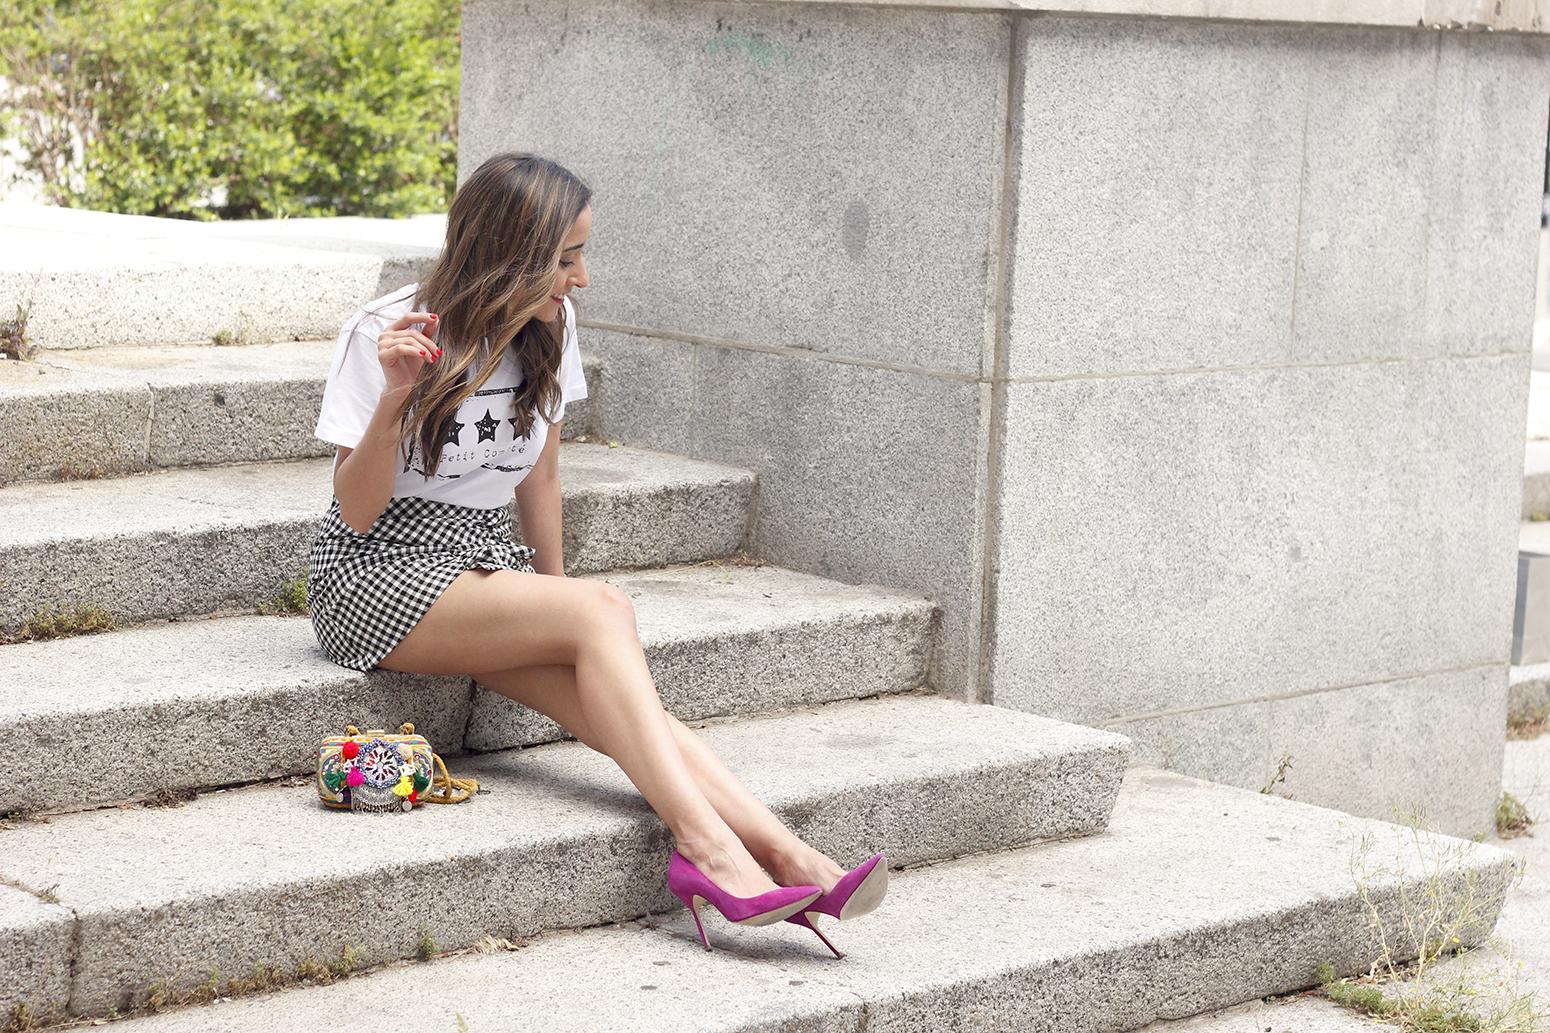 vichy skirt white t-shirt carolina herrera pink heels outfit style fashion summer01